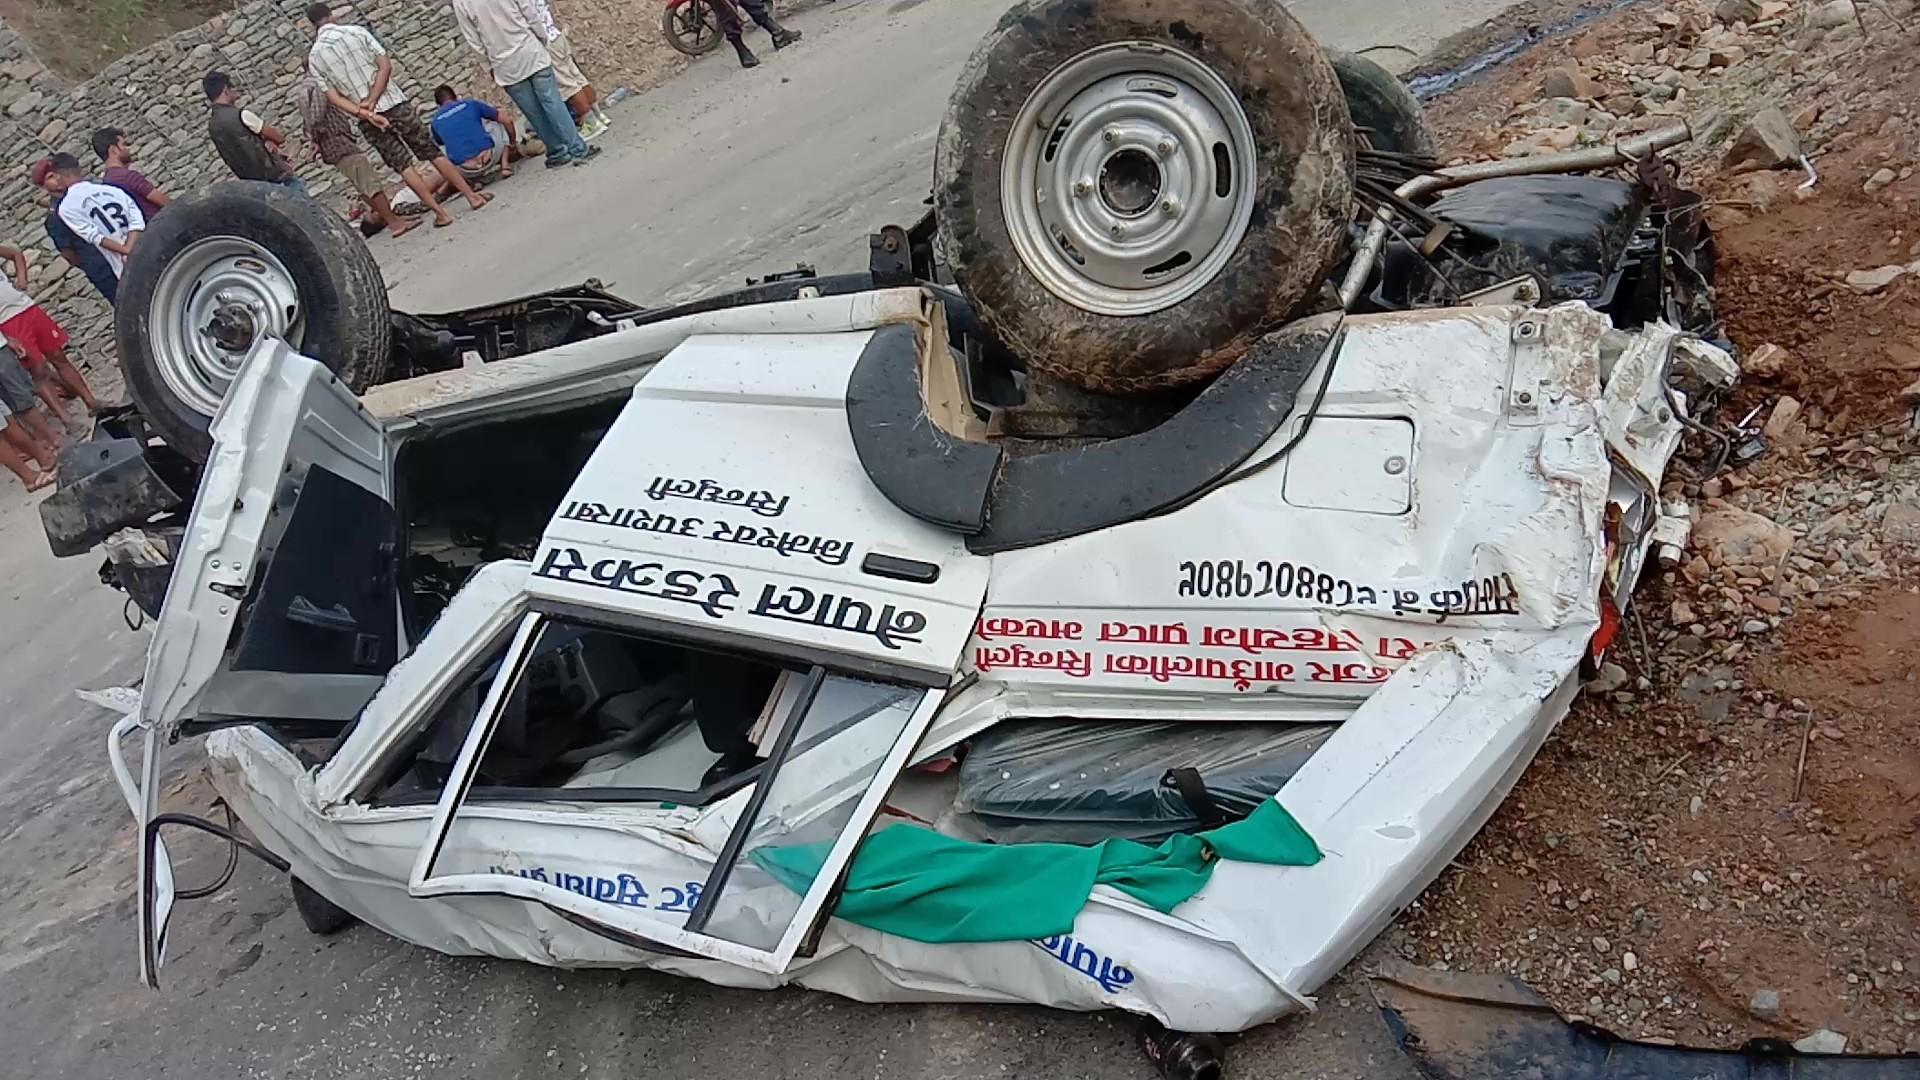 रामेछापमा एम्बुलेन्स दुर्घटना, चालकको मृत्यु